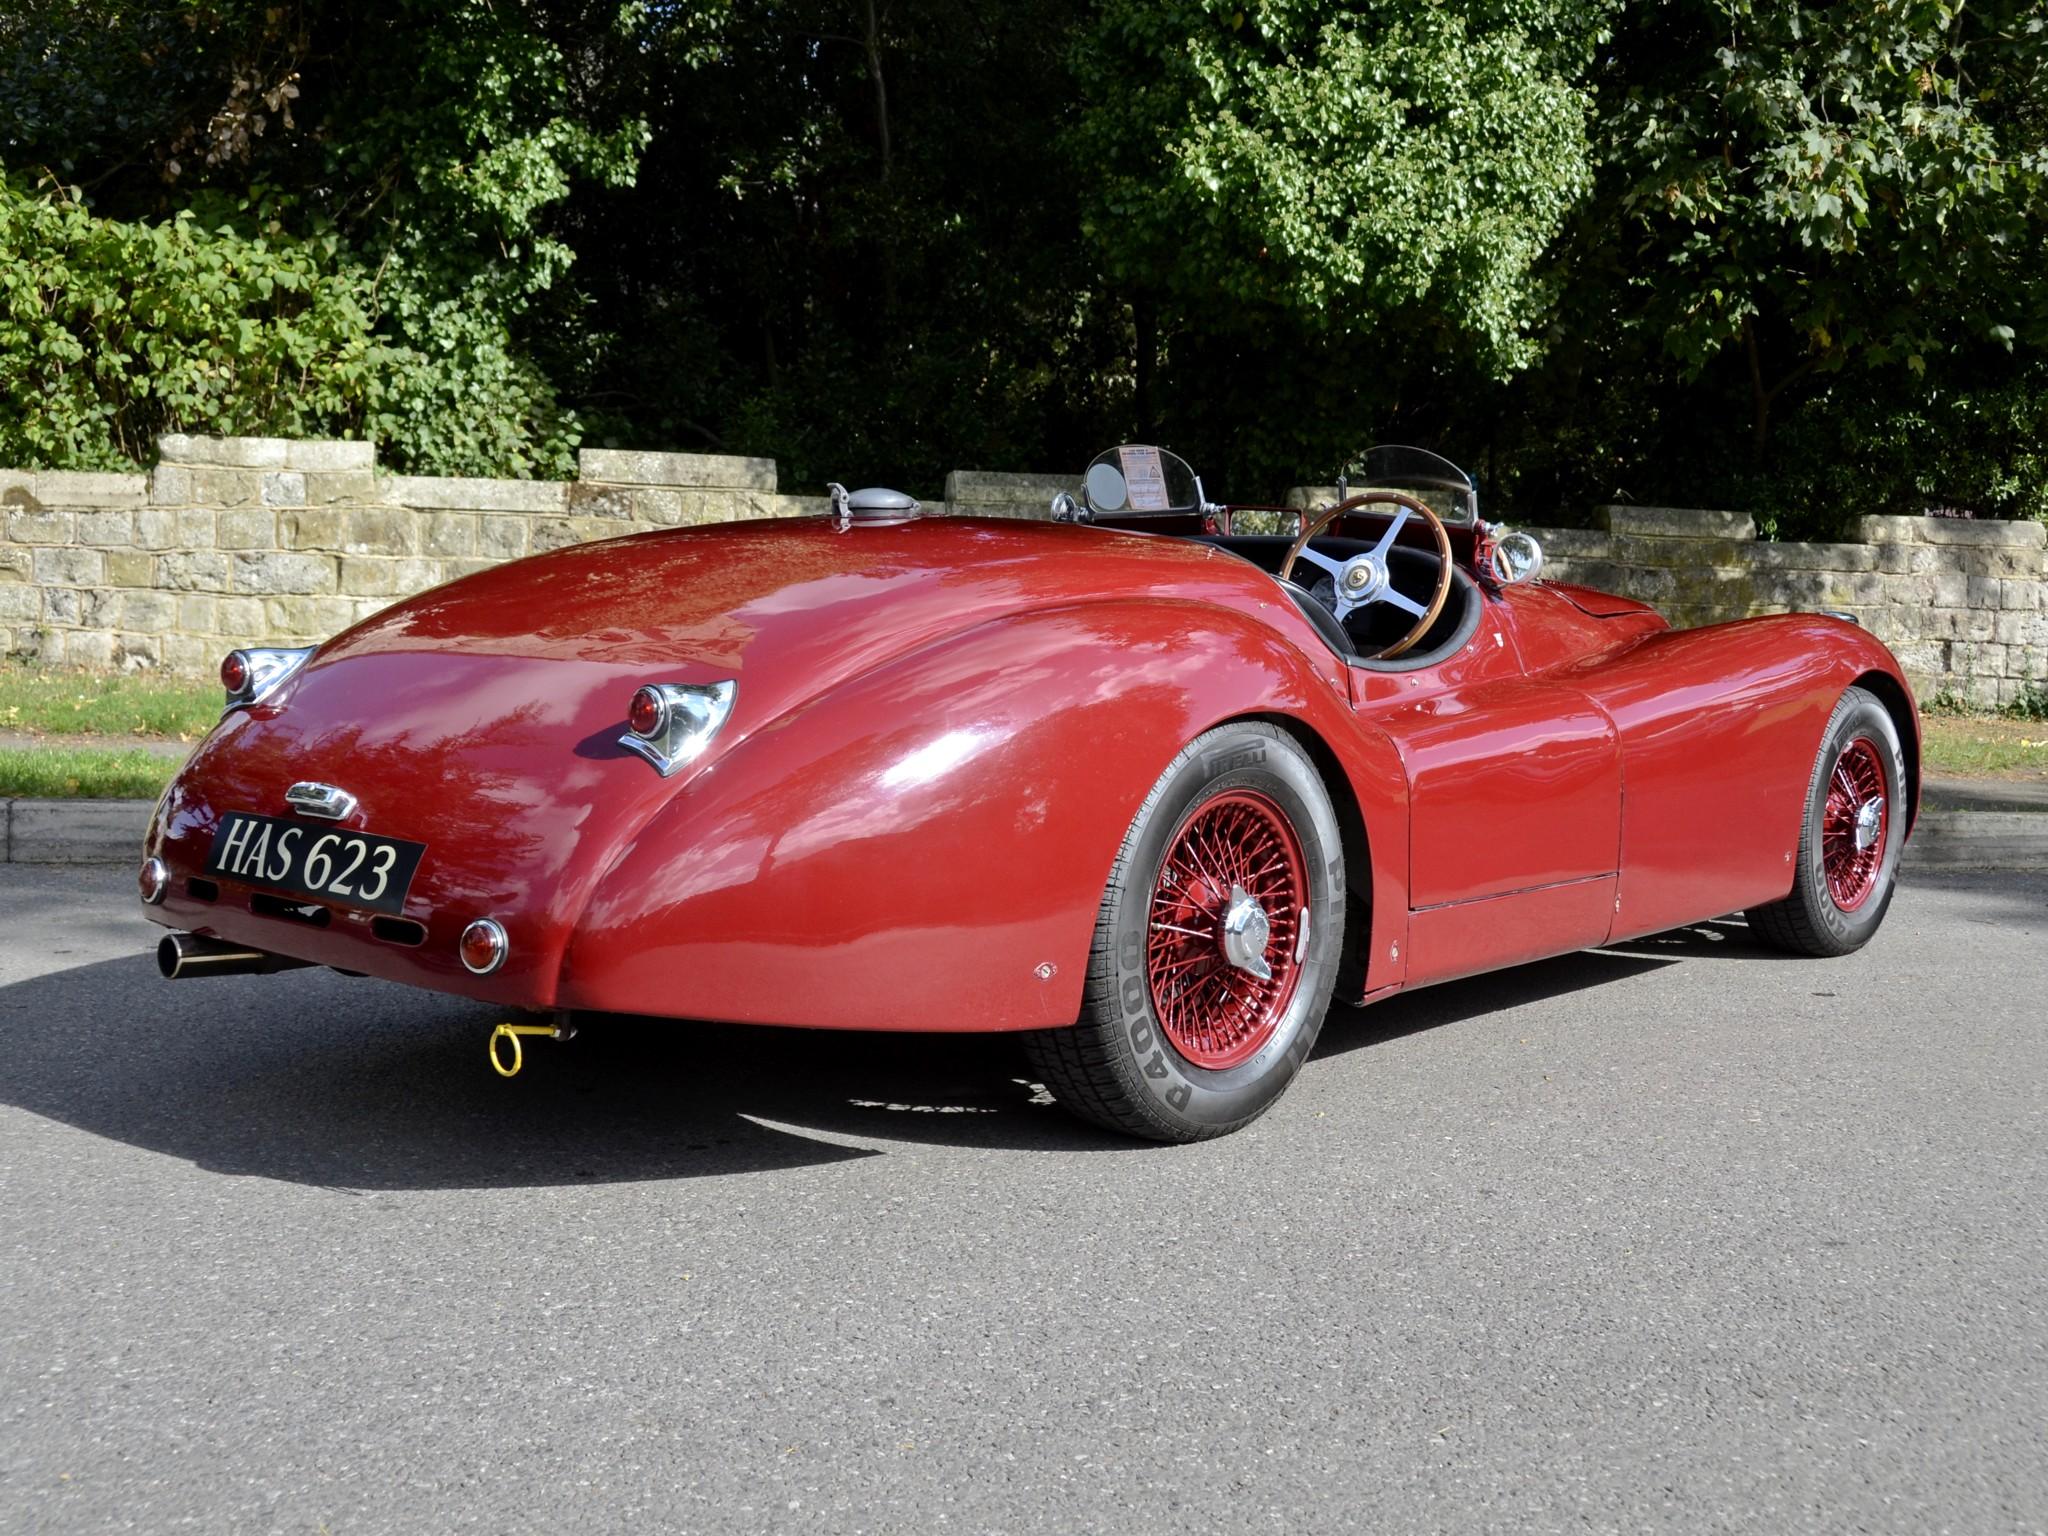 1950 Jaguar Xk120 Lt2 Alloy Roadster Race Racing Supercar